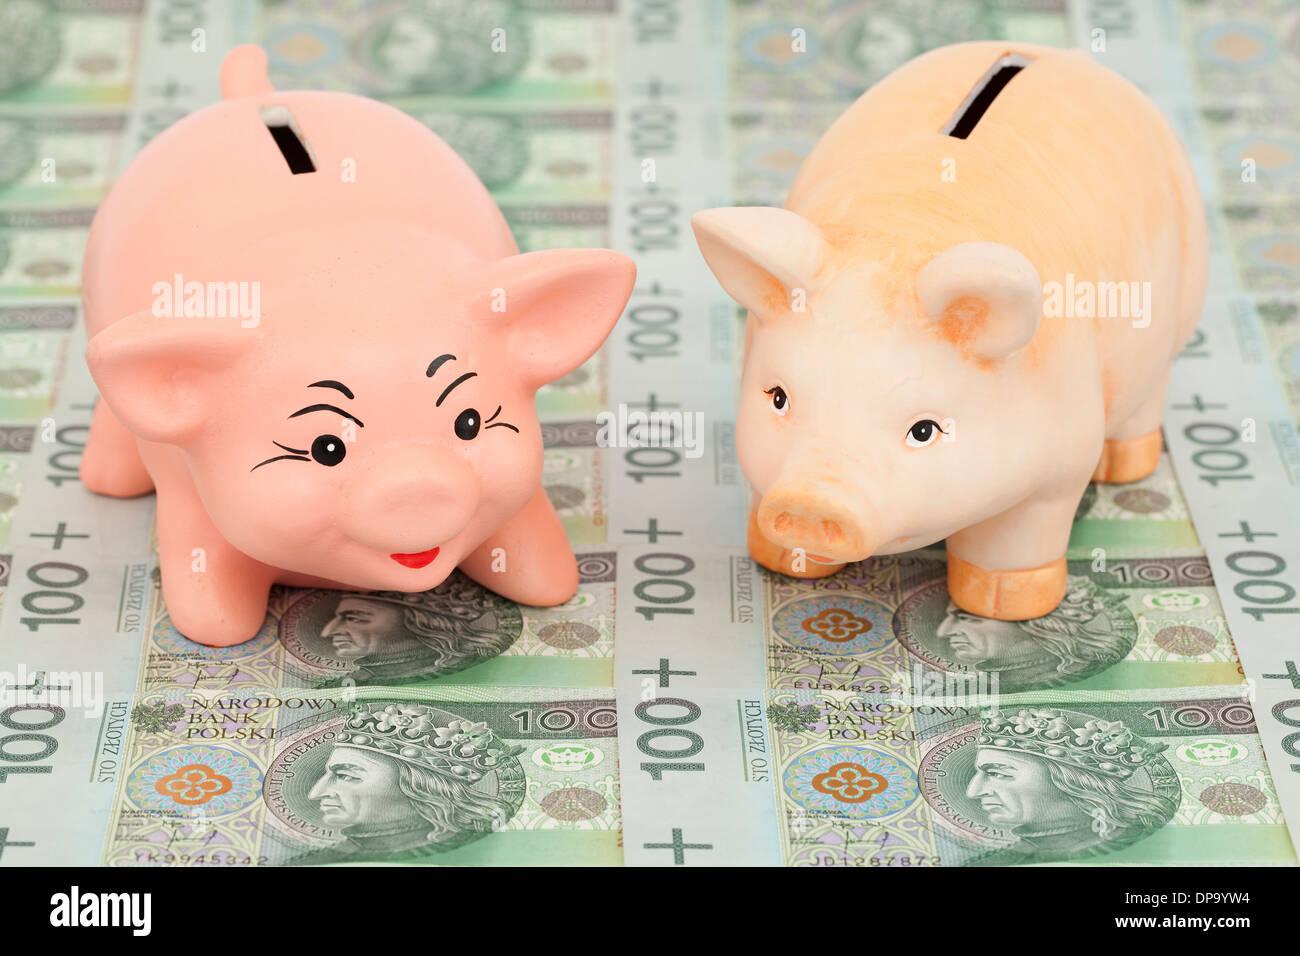 two piggy on polish money as background - Stock Image